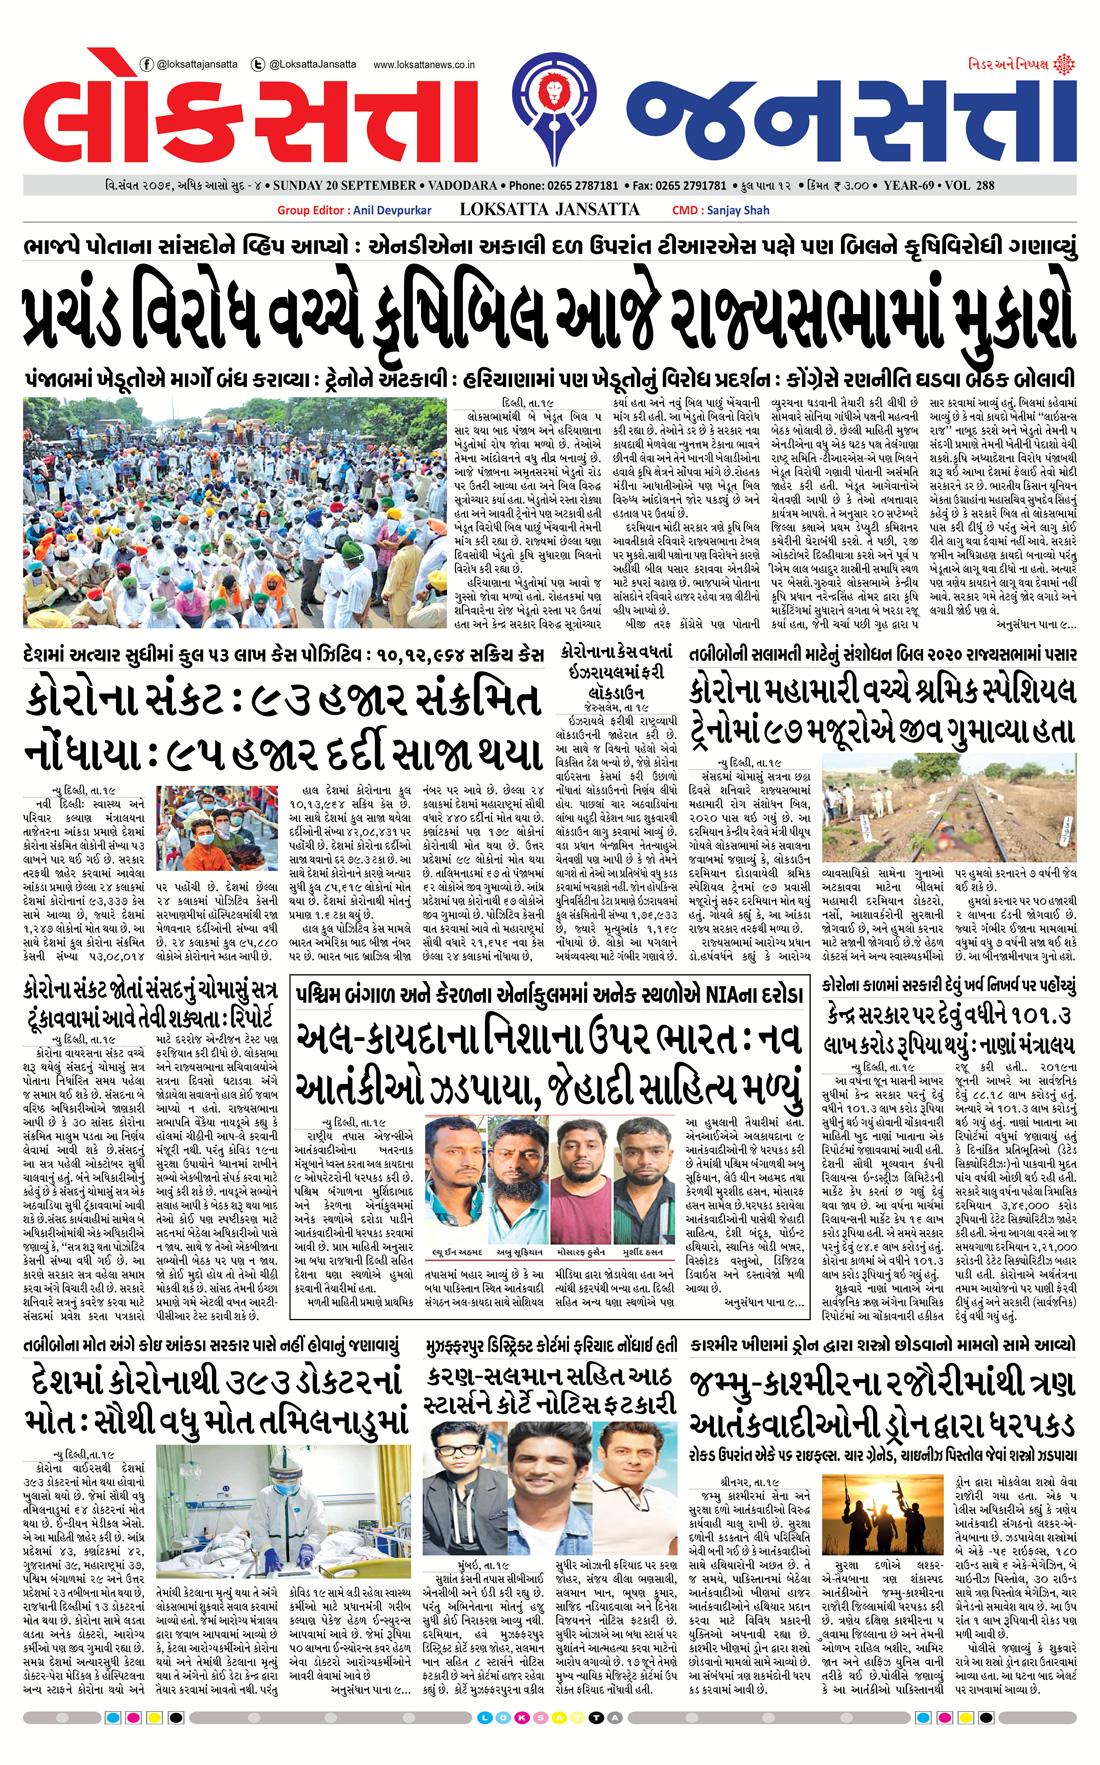 Loksatta Jansatta News Papaer E-paper dated 2020-09-20 | Page 1